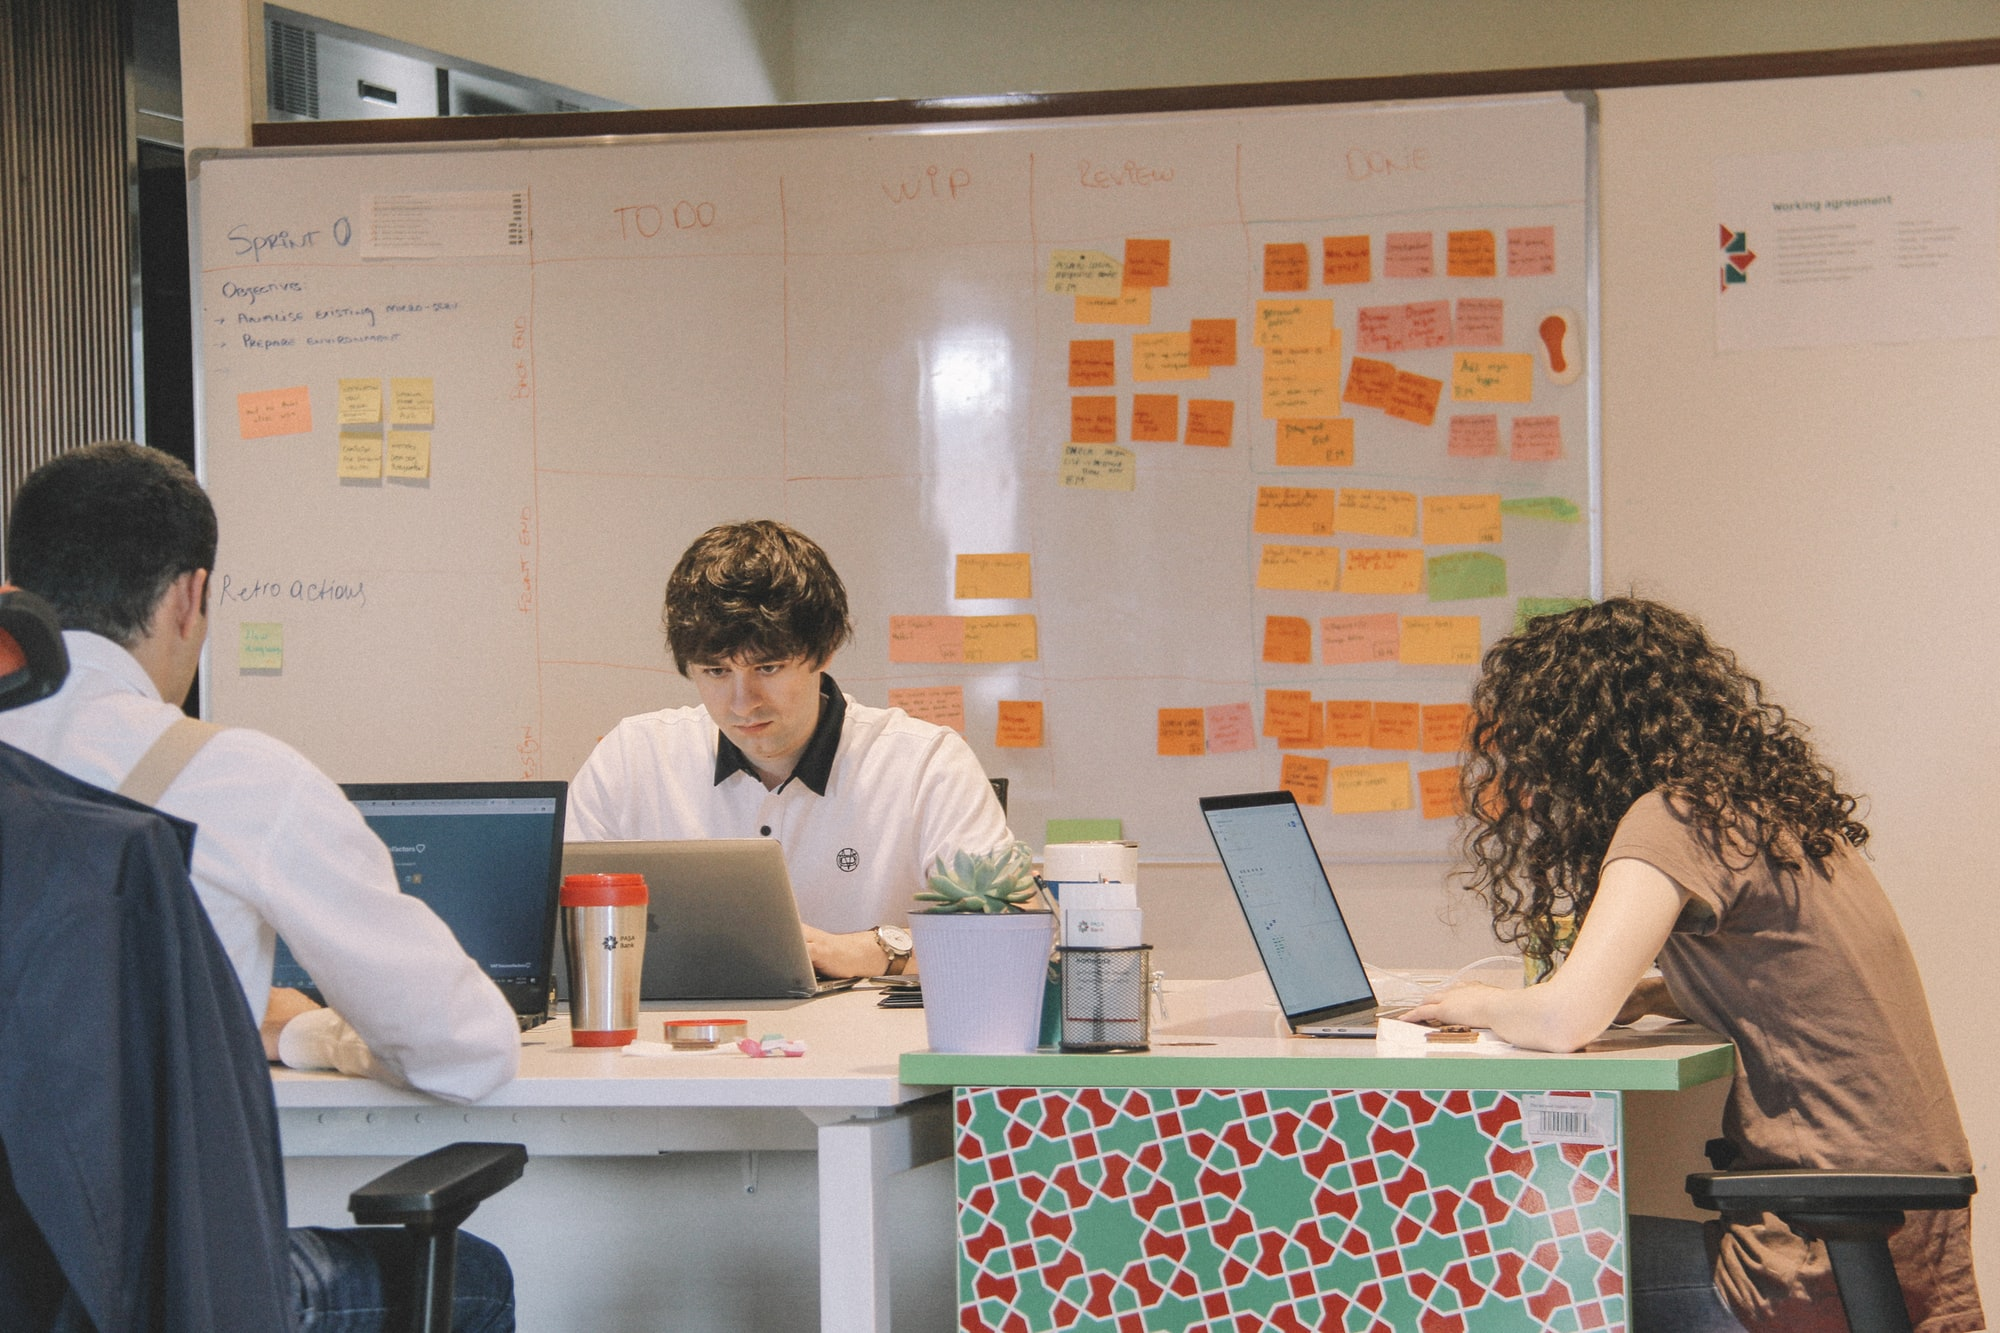 Implementing DevOps in Your Organisation